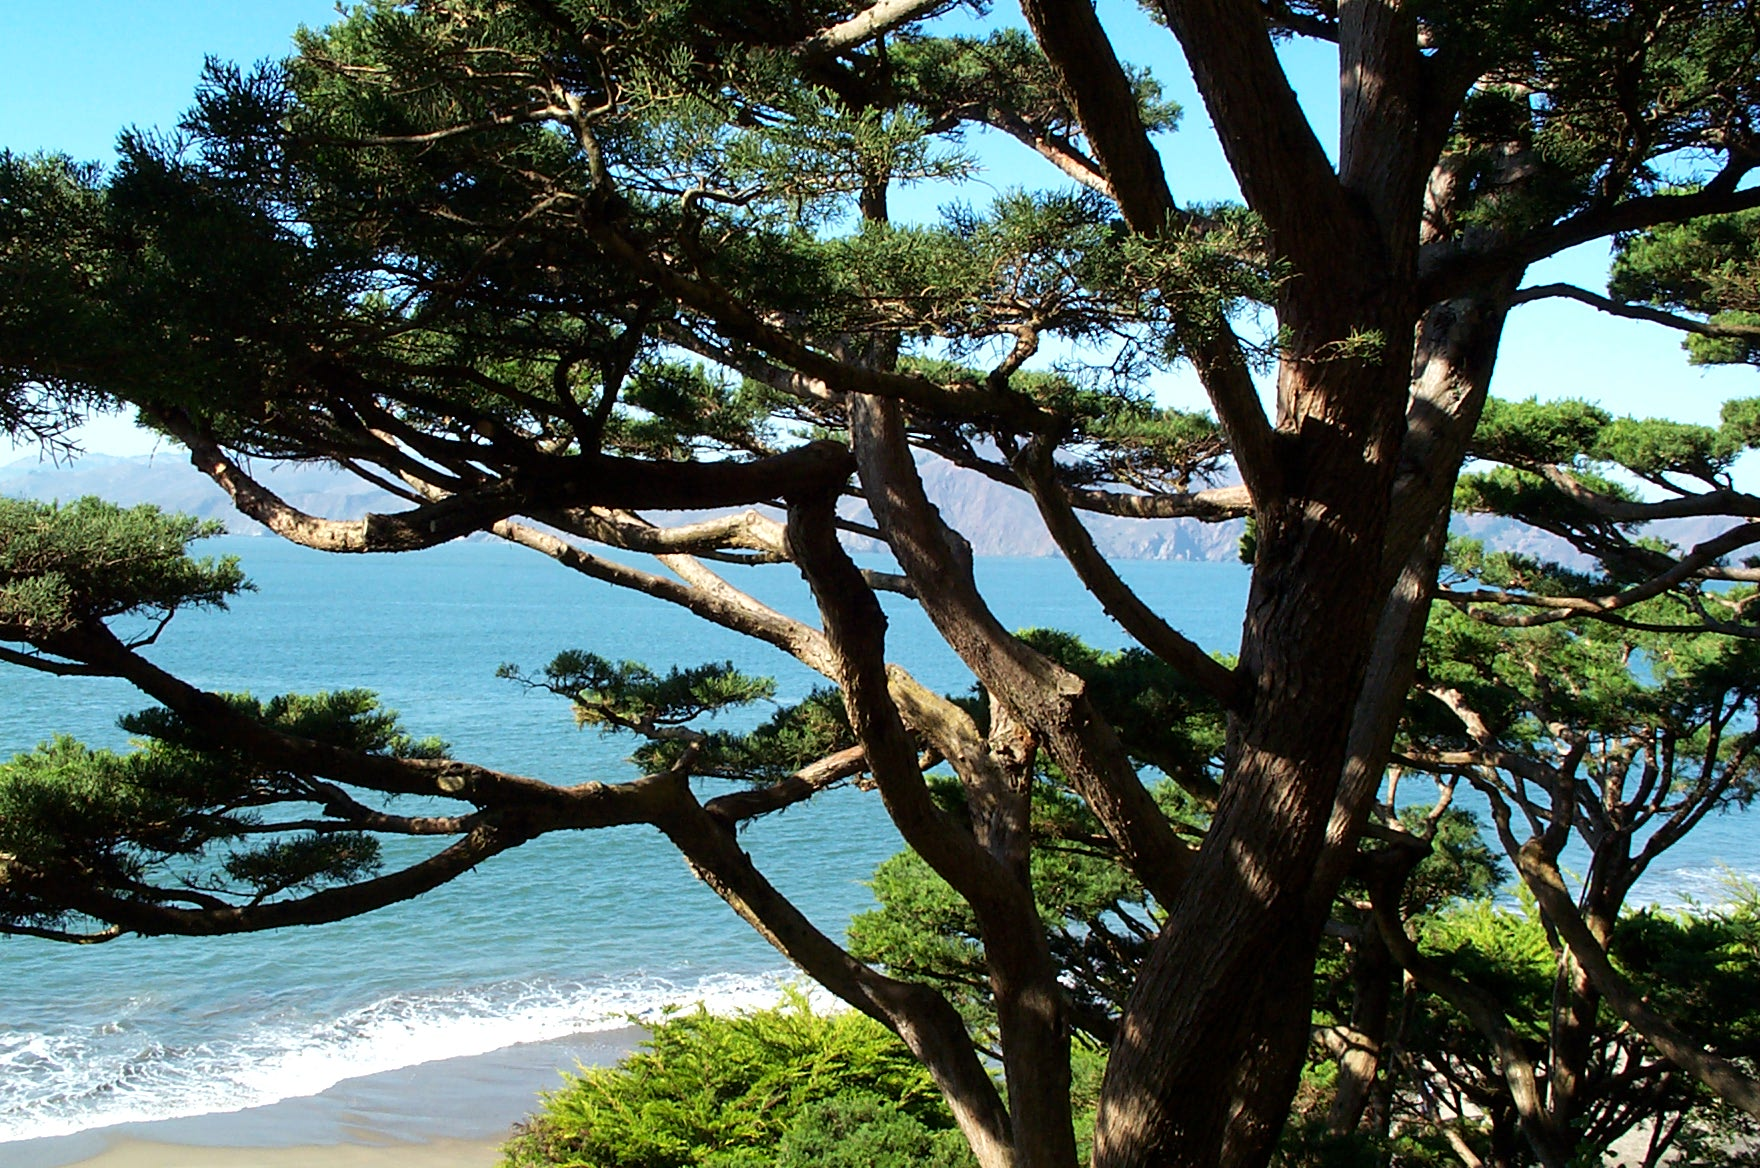 Bay Area Arborist Cooperative Tree Consultation